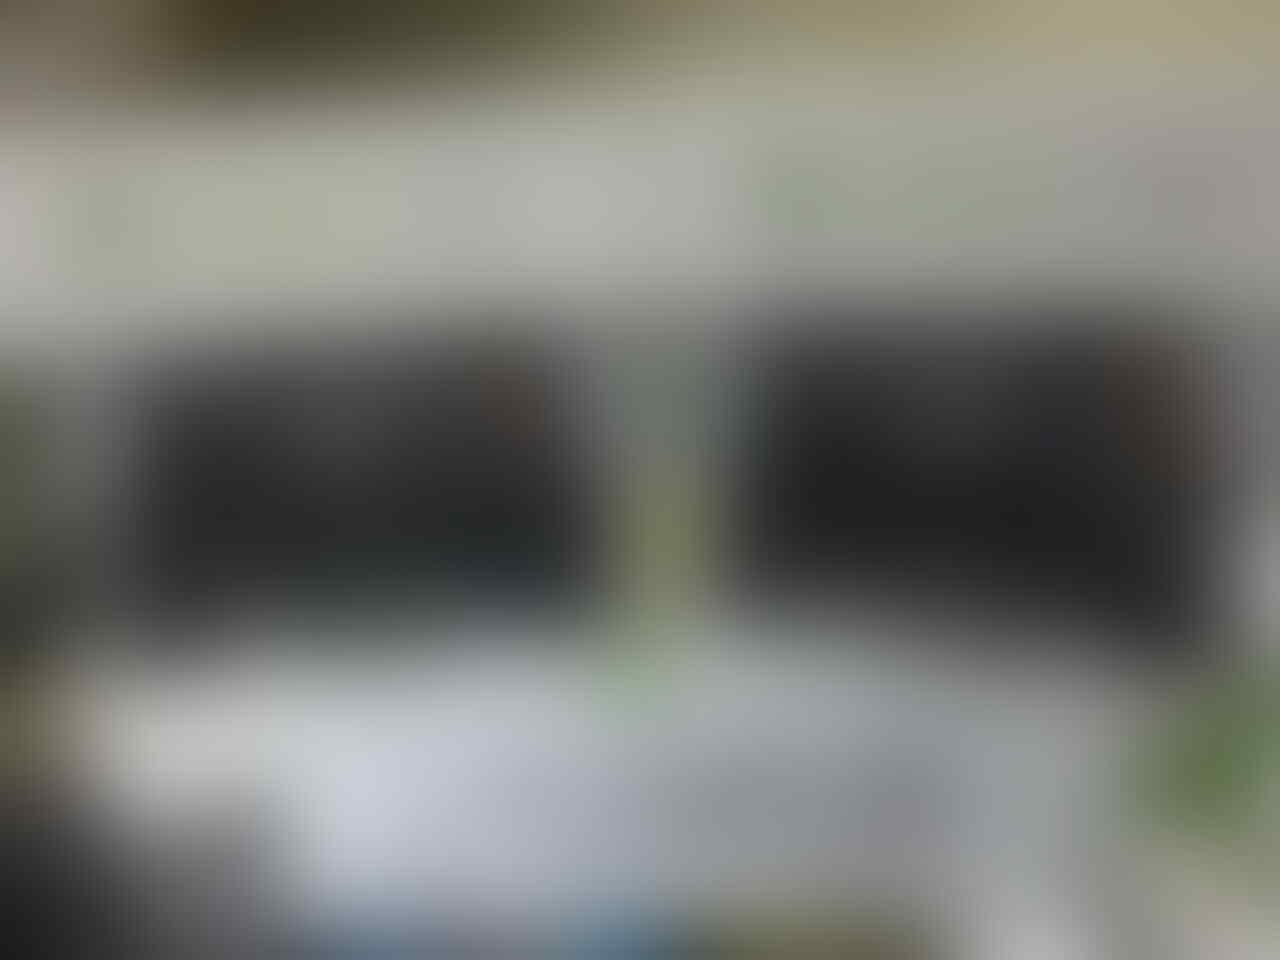 | zLTech | > Controller Stick xbox for PC (wired, wireless ORI inside!!) TERMURAH!!!